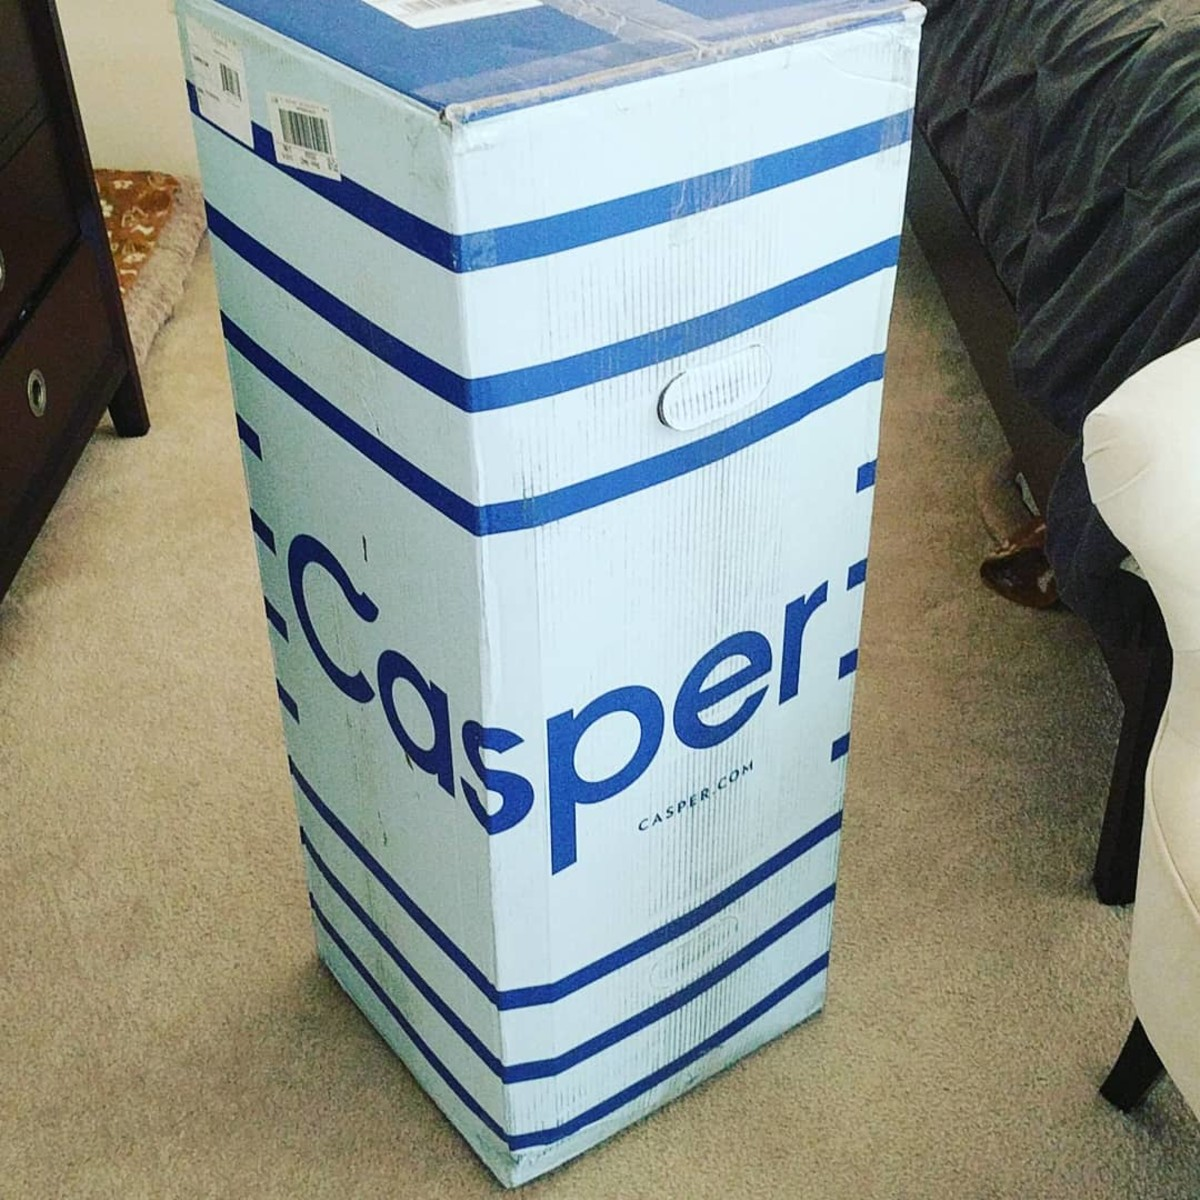 My Casper arrived in a sturdy cardboard box - surprisingly small for a mattress!